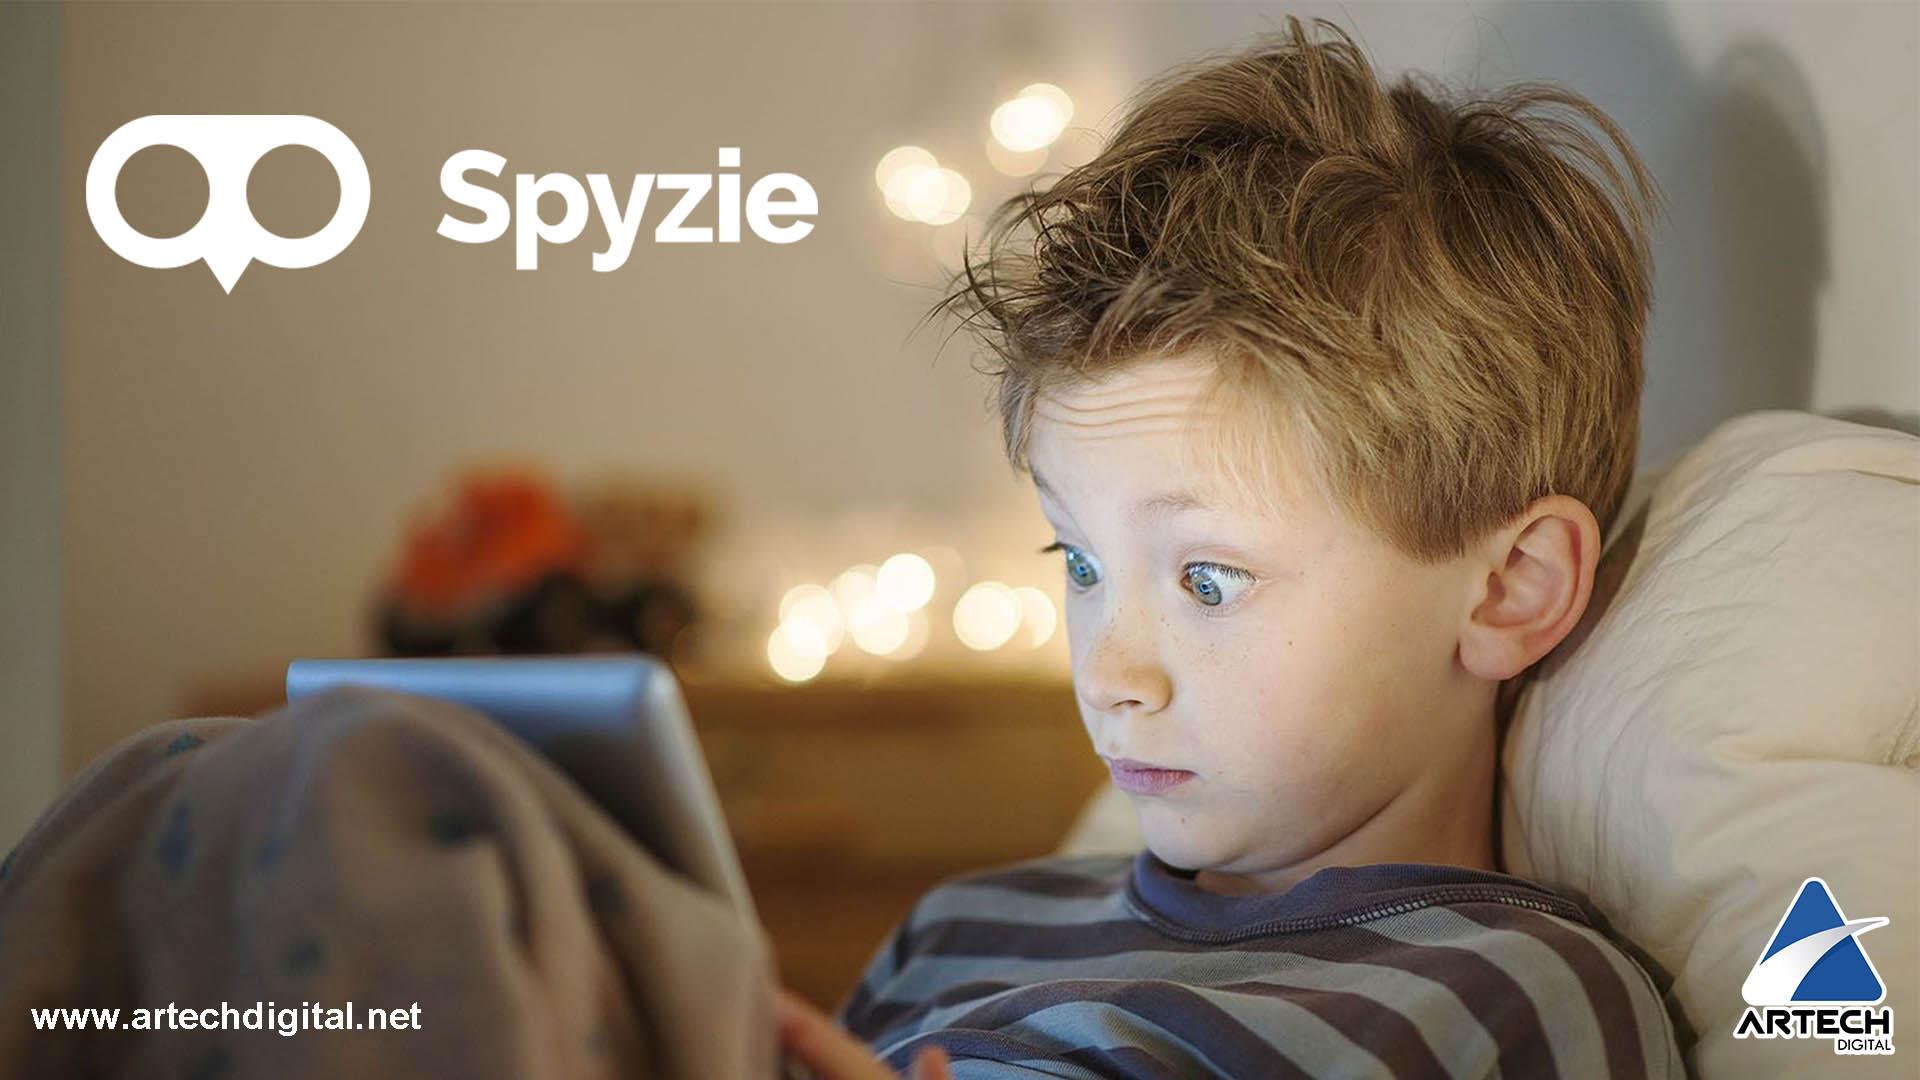 Artech Digital - Nueva App Spyzie